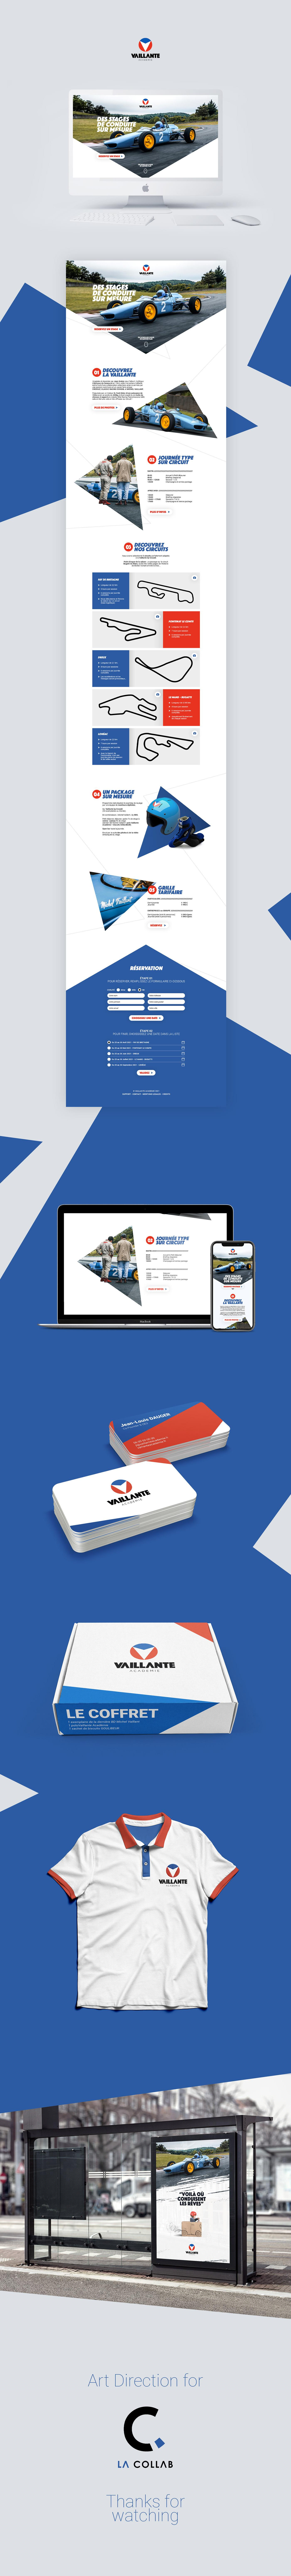 Image may contain: screenshot, businesscard and cartoon